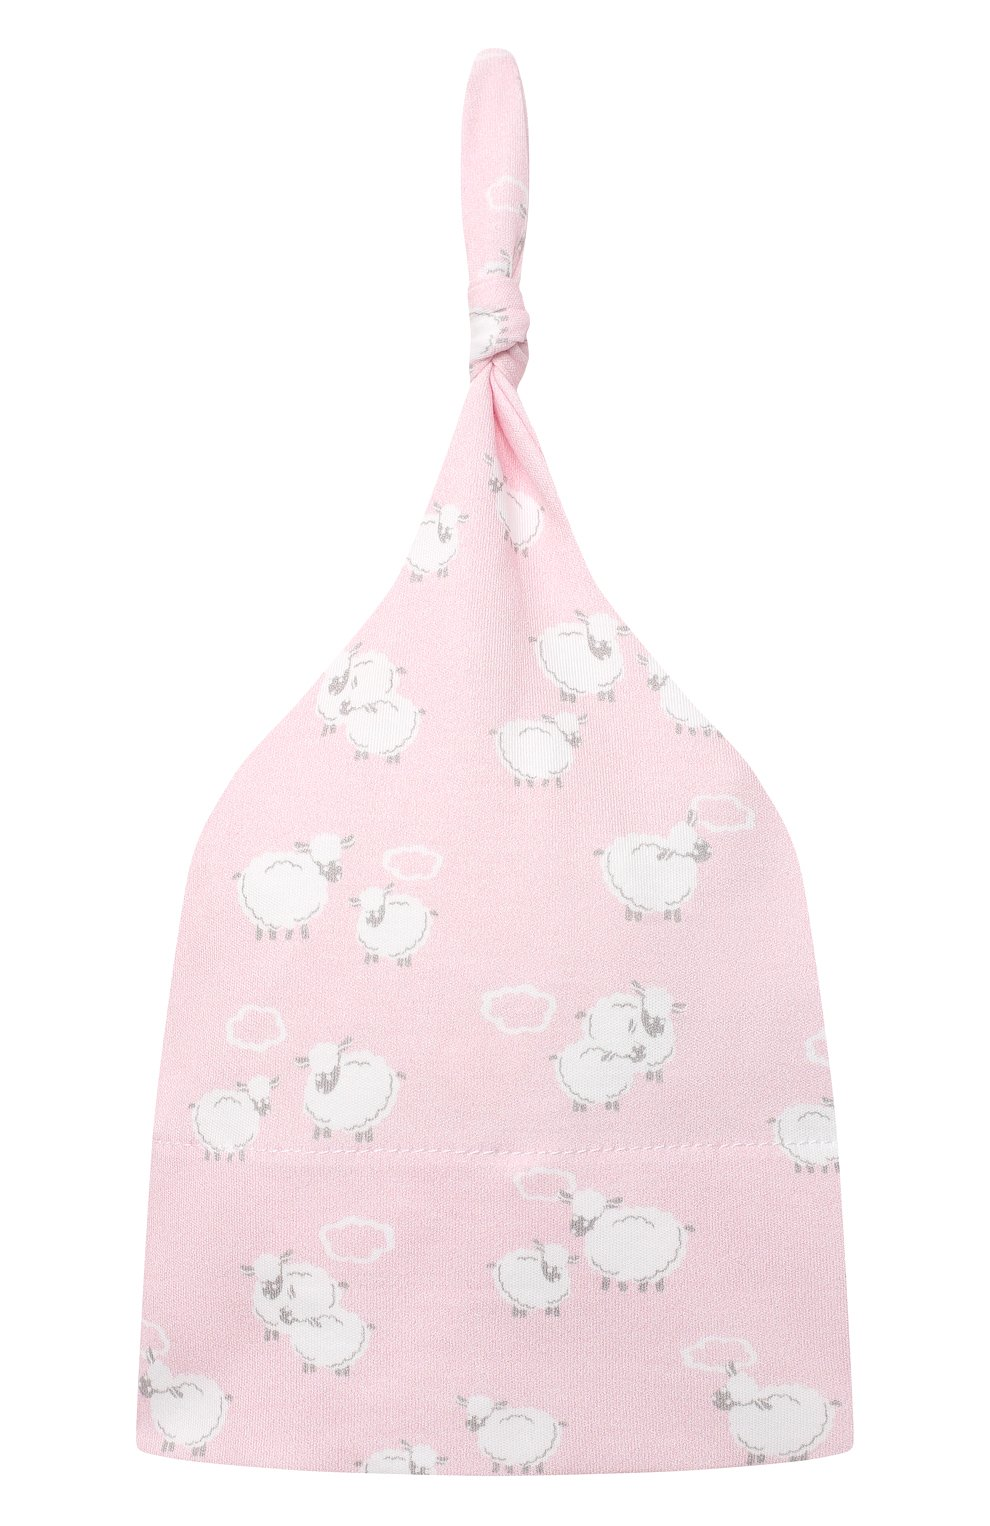 Детского комплект из платья на завязке и шапки KISSY KISSY розового цвета, арт. KGW05039N | Фото 4 (Материал внешний: Хлопок; Ростовка одежда: 0 - 3 мес | 50 - 60 см)